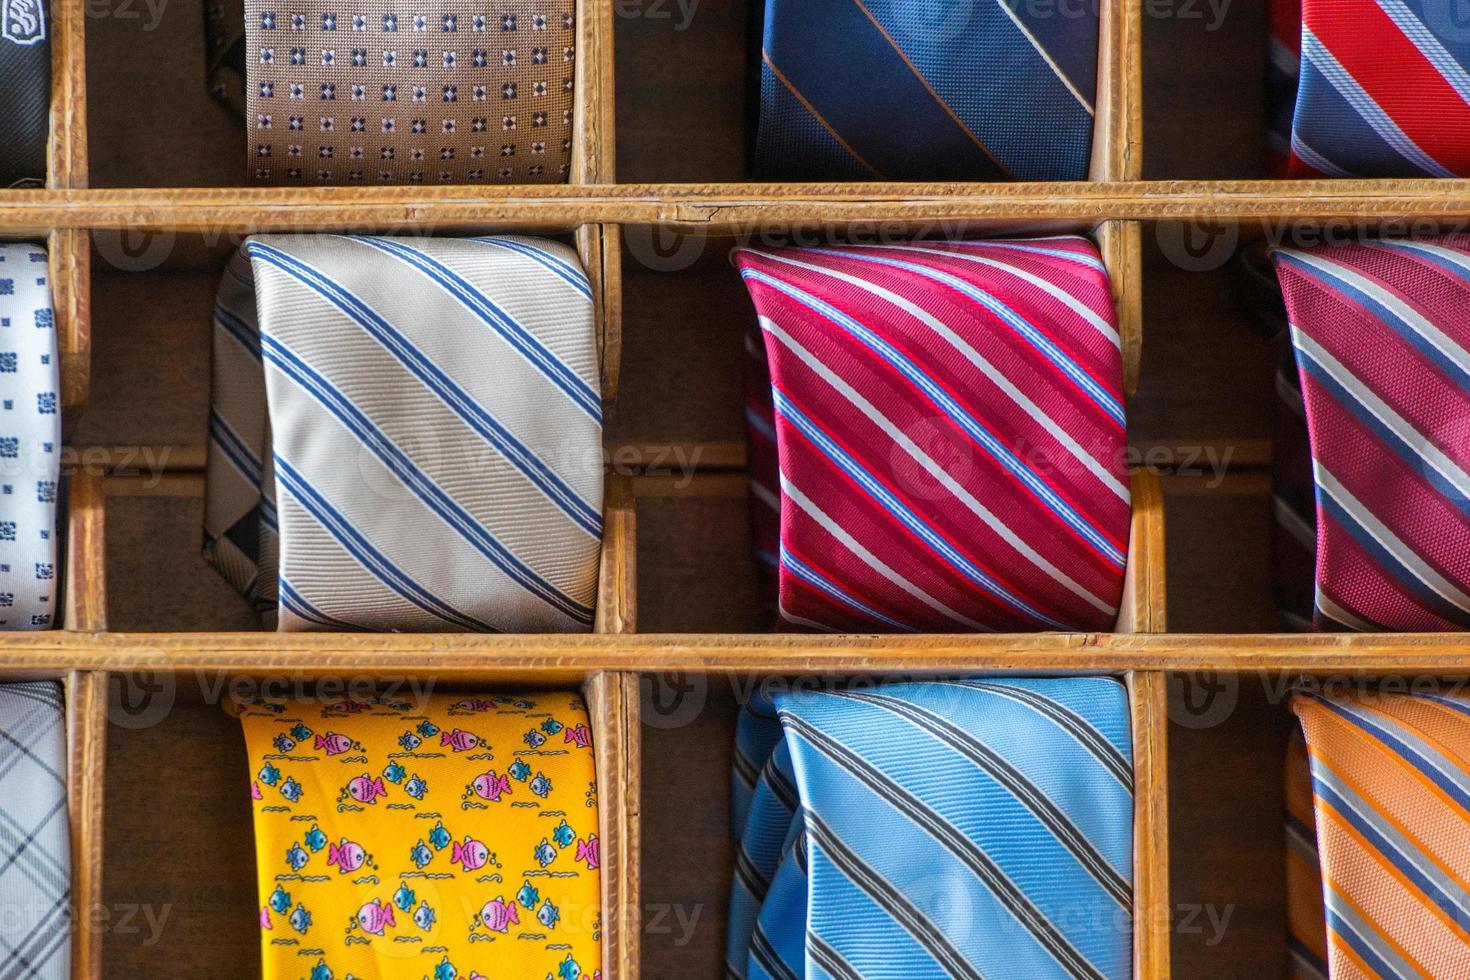 italian made in italy silk tie on display photo